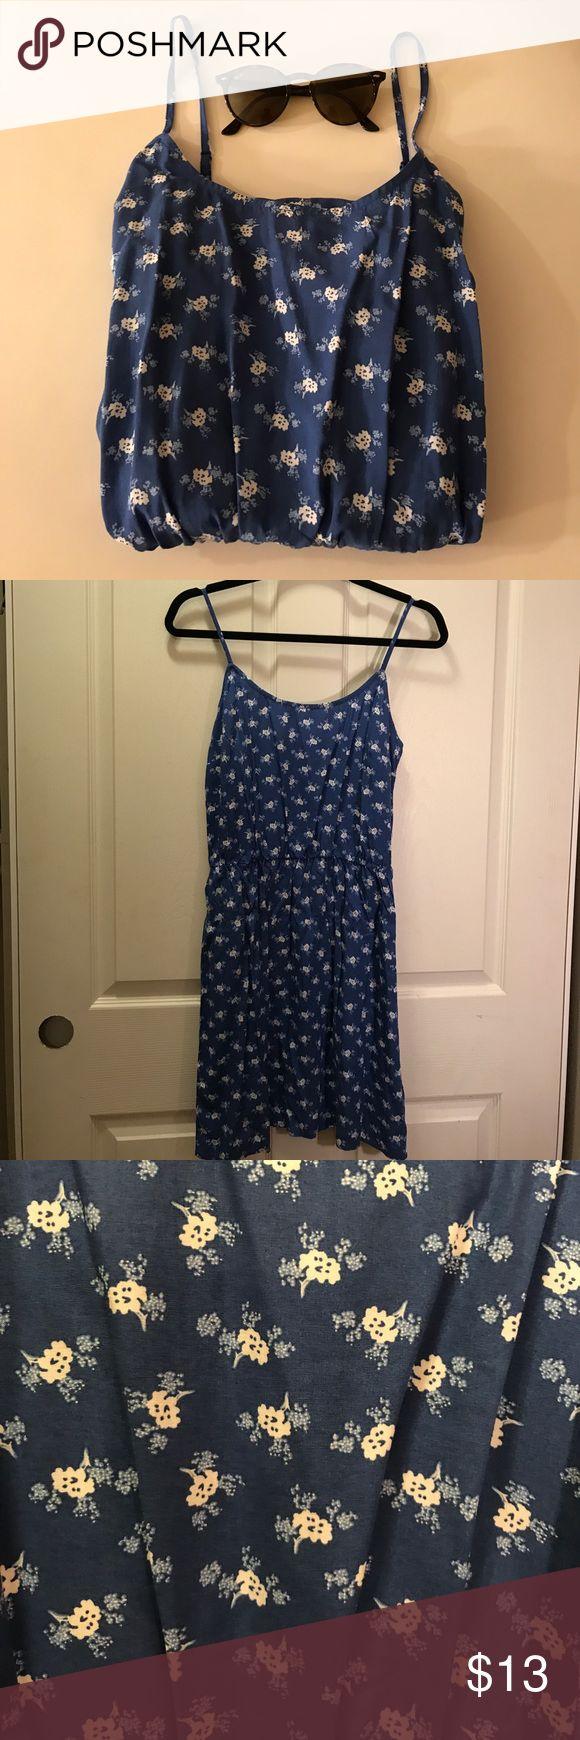 Cami Blue and White Dress Cami Blue and White Dress Old Navy Dresses Midi